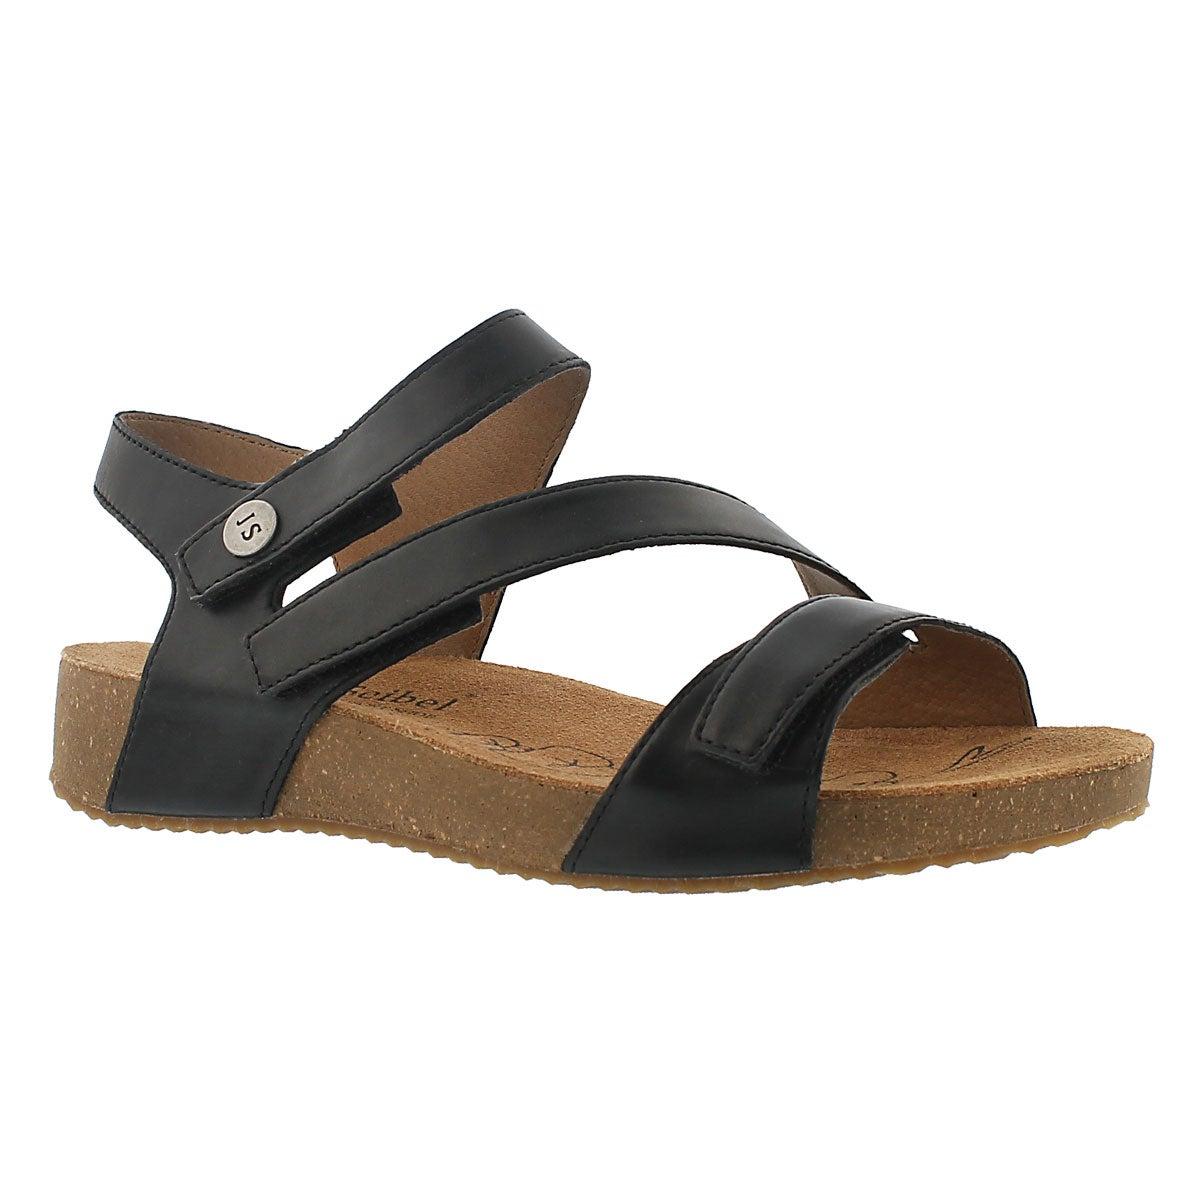 Women's TONGA 25 black casual sandals